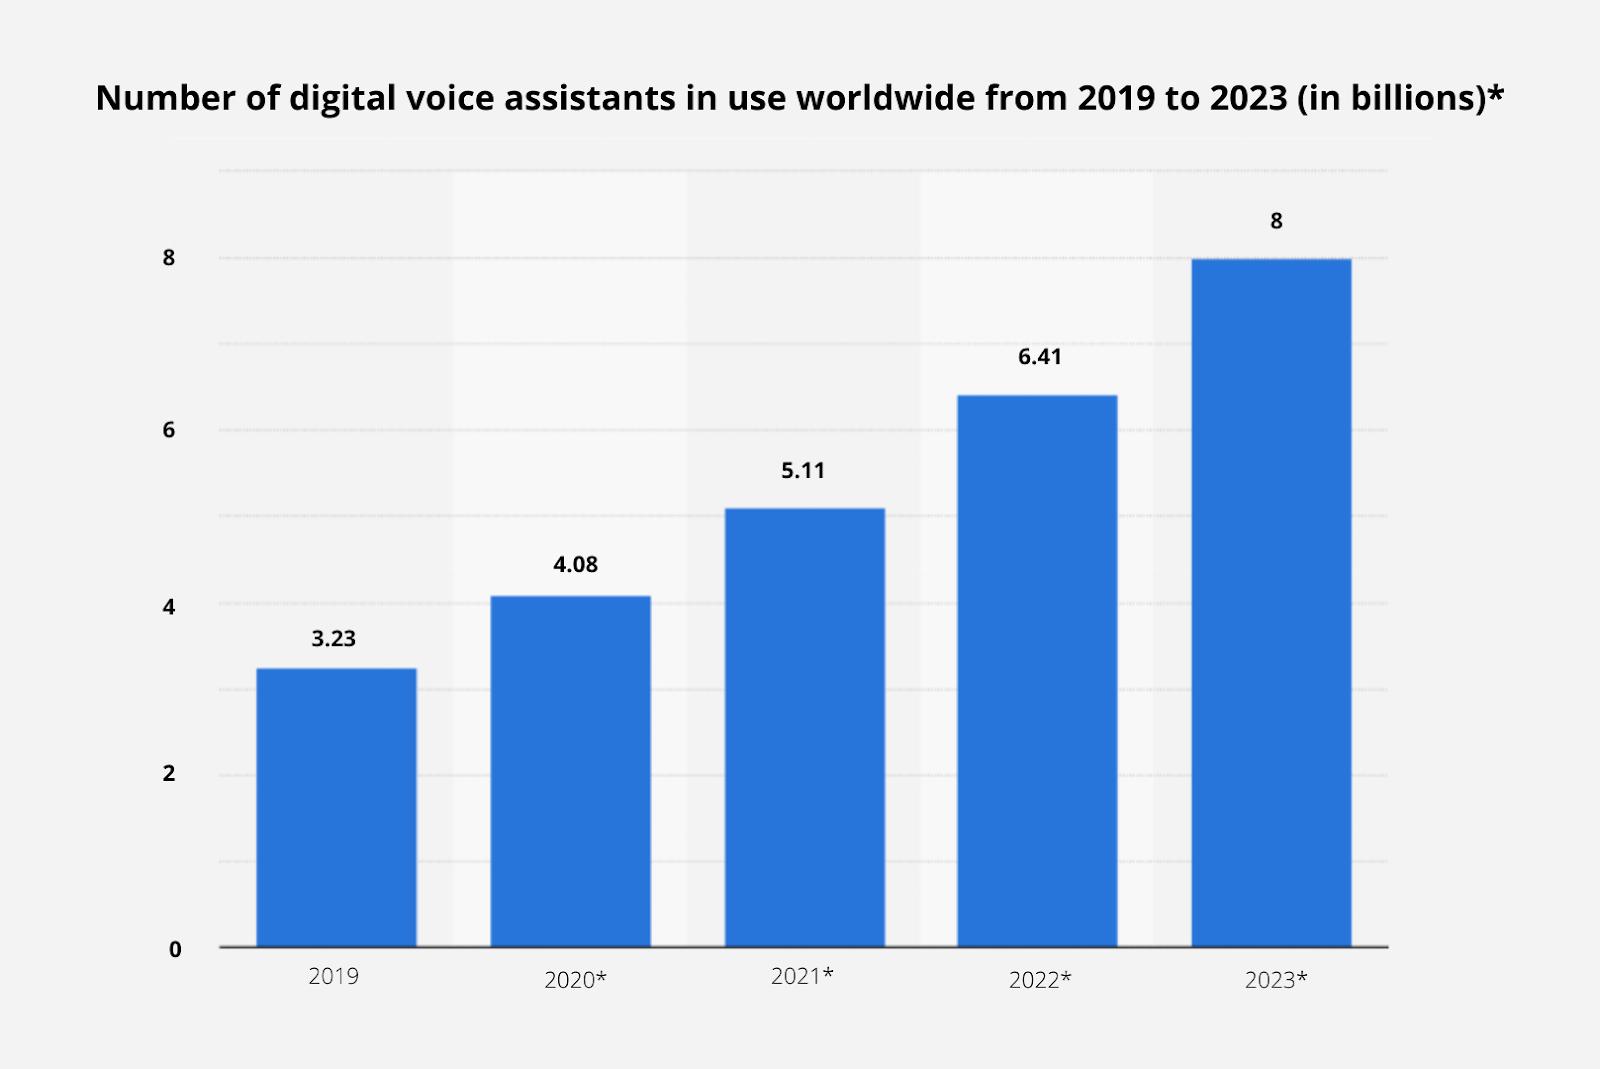 Number of digital voice assistants